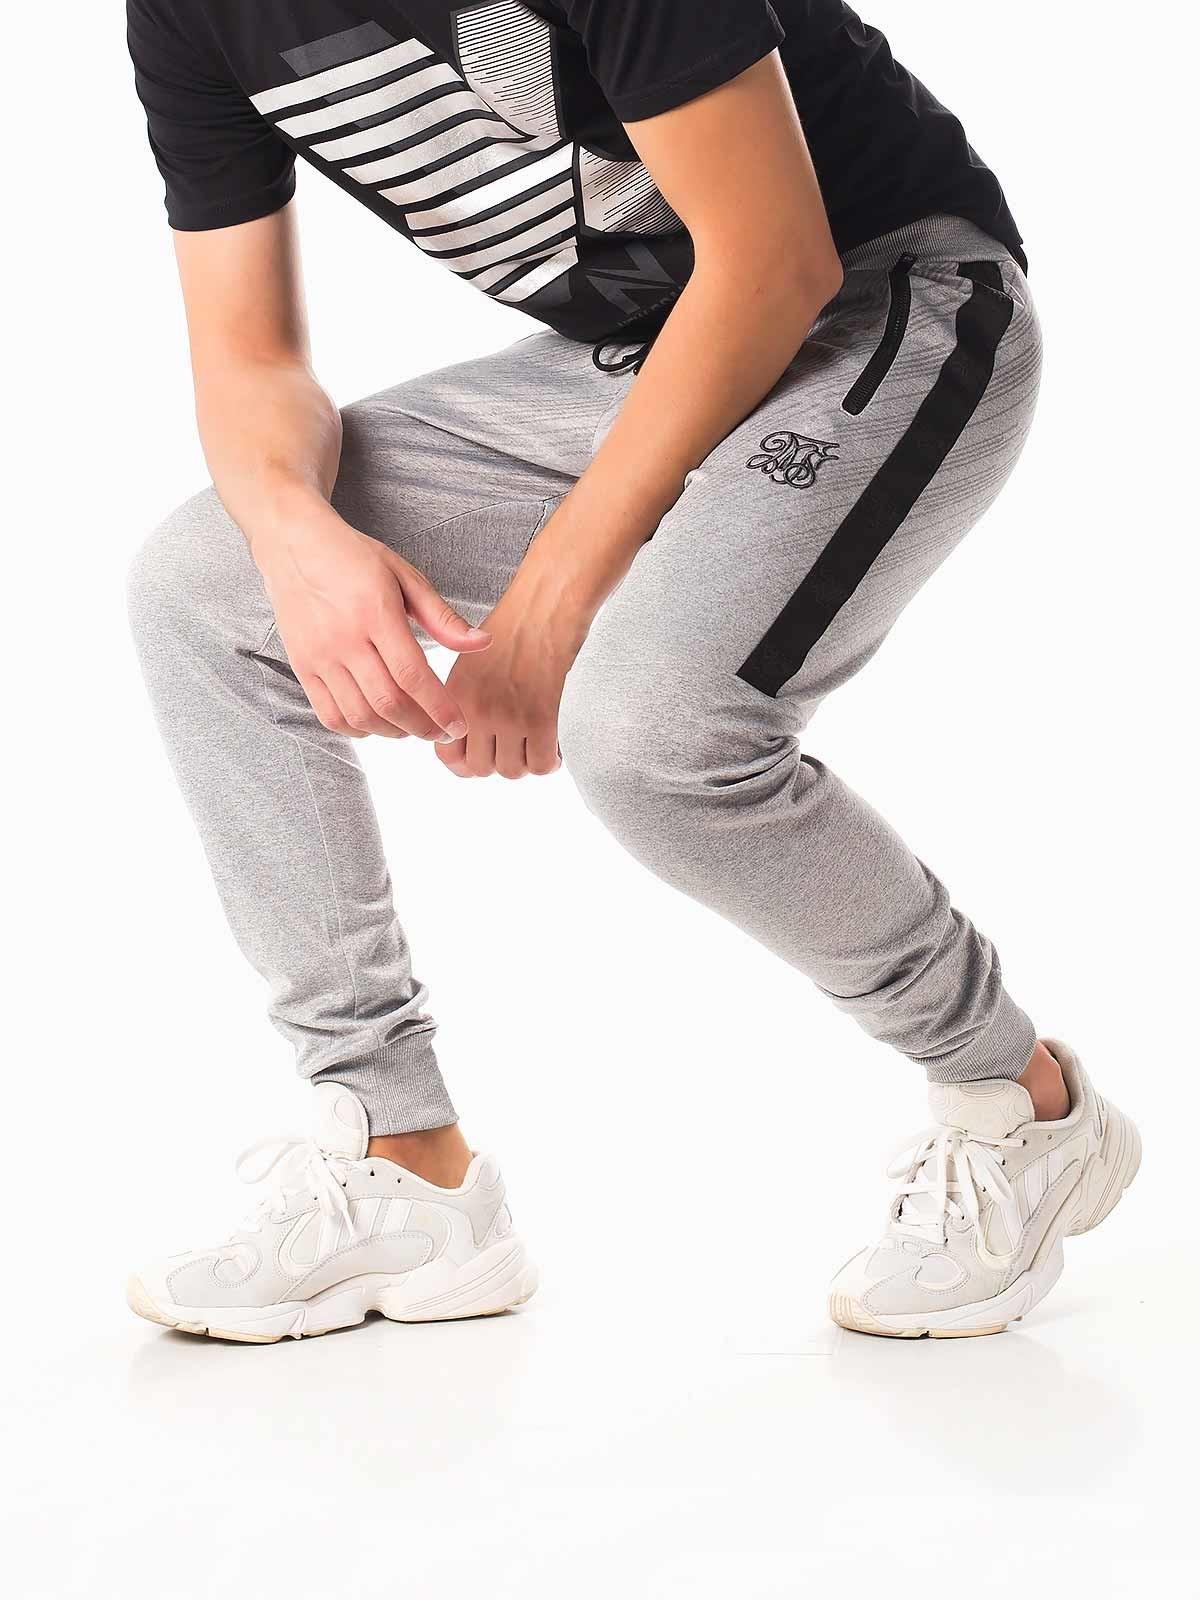 Pantalones de chándal ajustados bordado